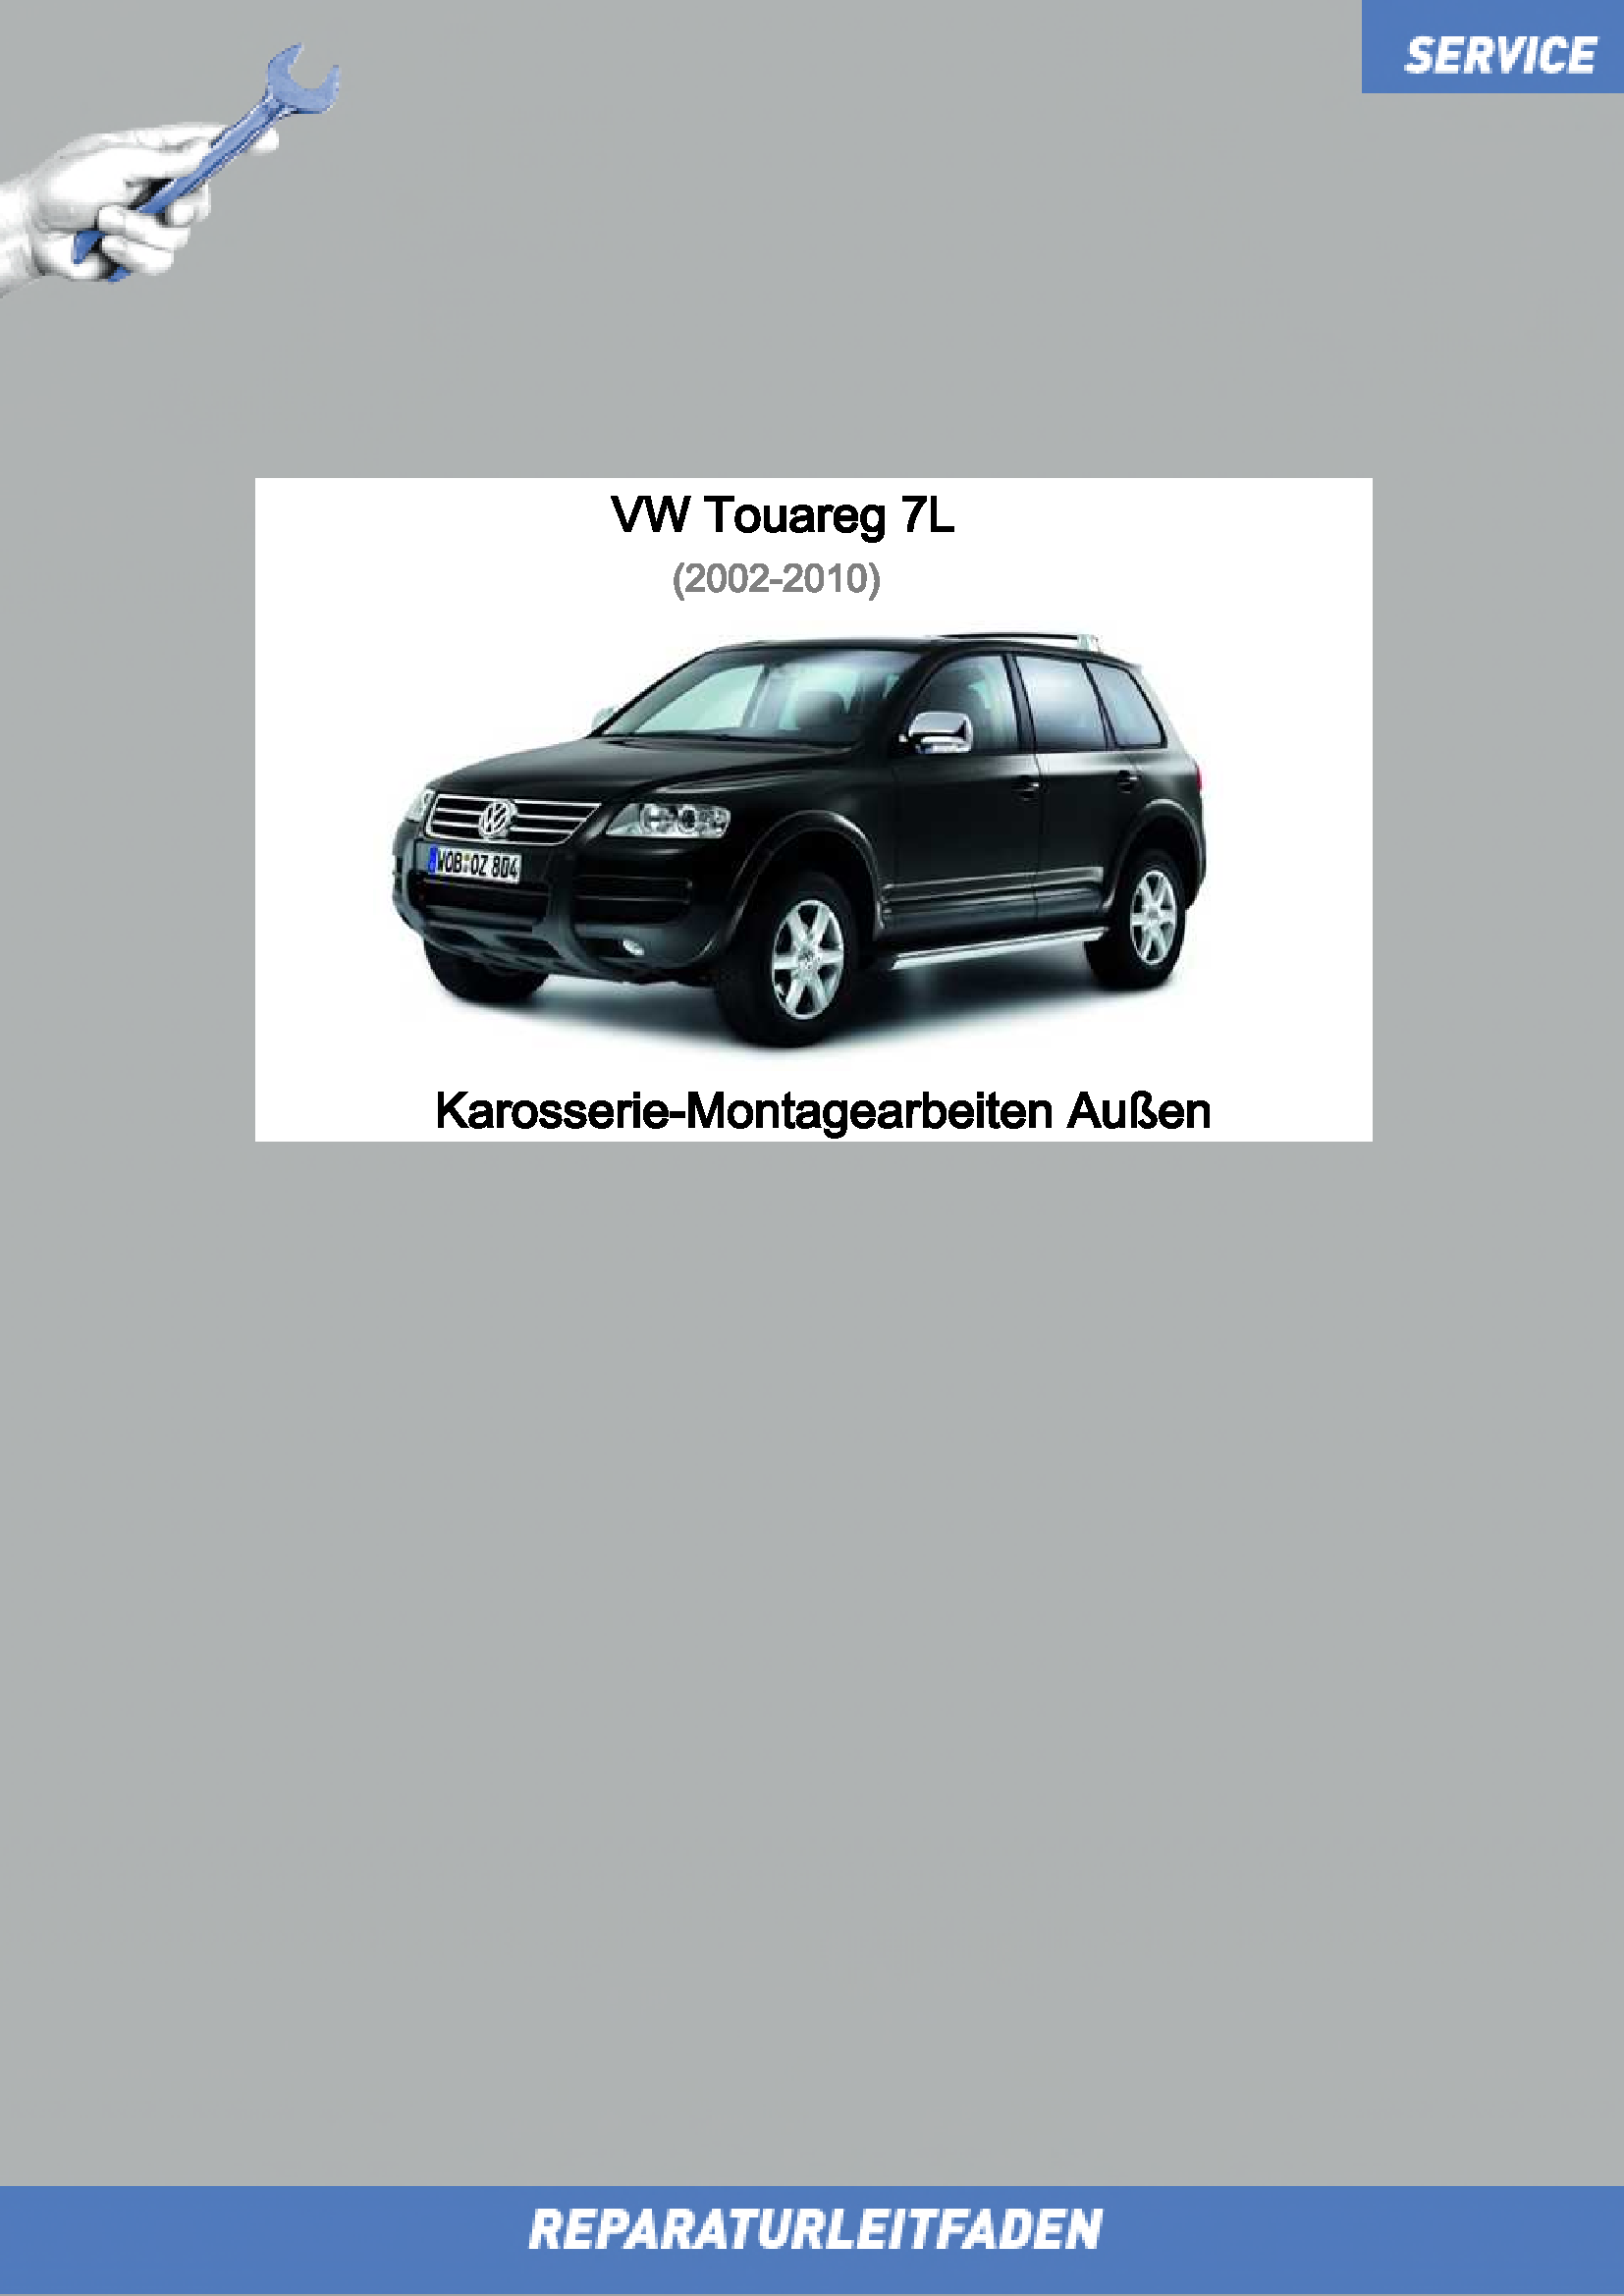 vw-touareg-7l-0005-karosserie_montagearbeiten_au_en_1.png